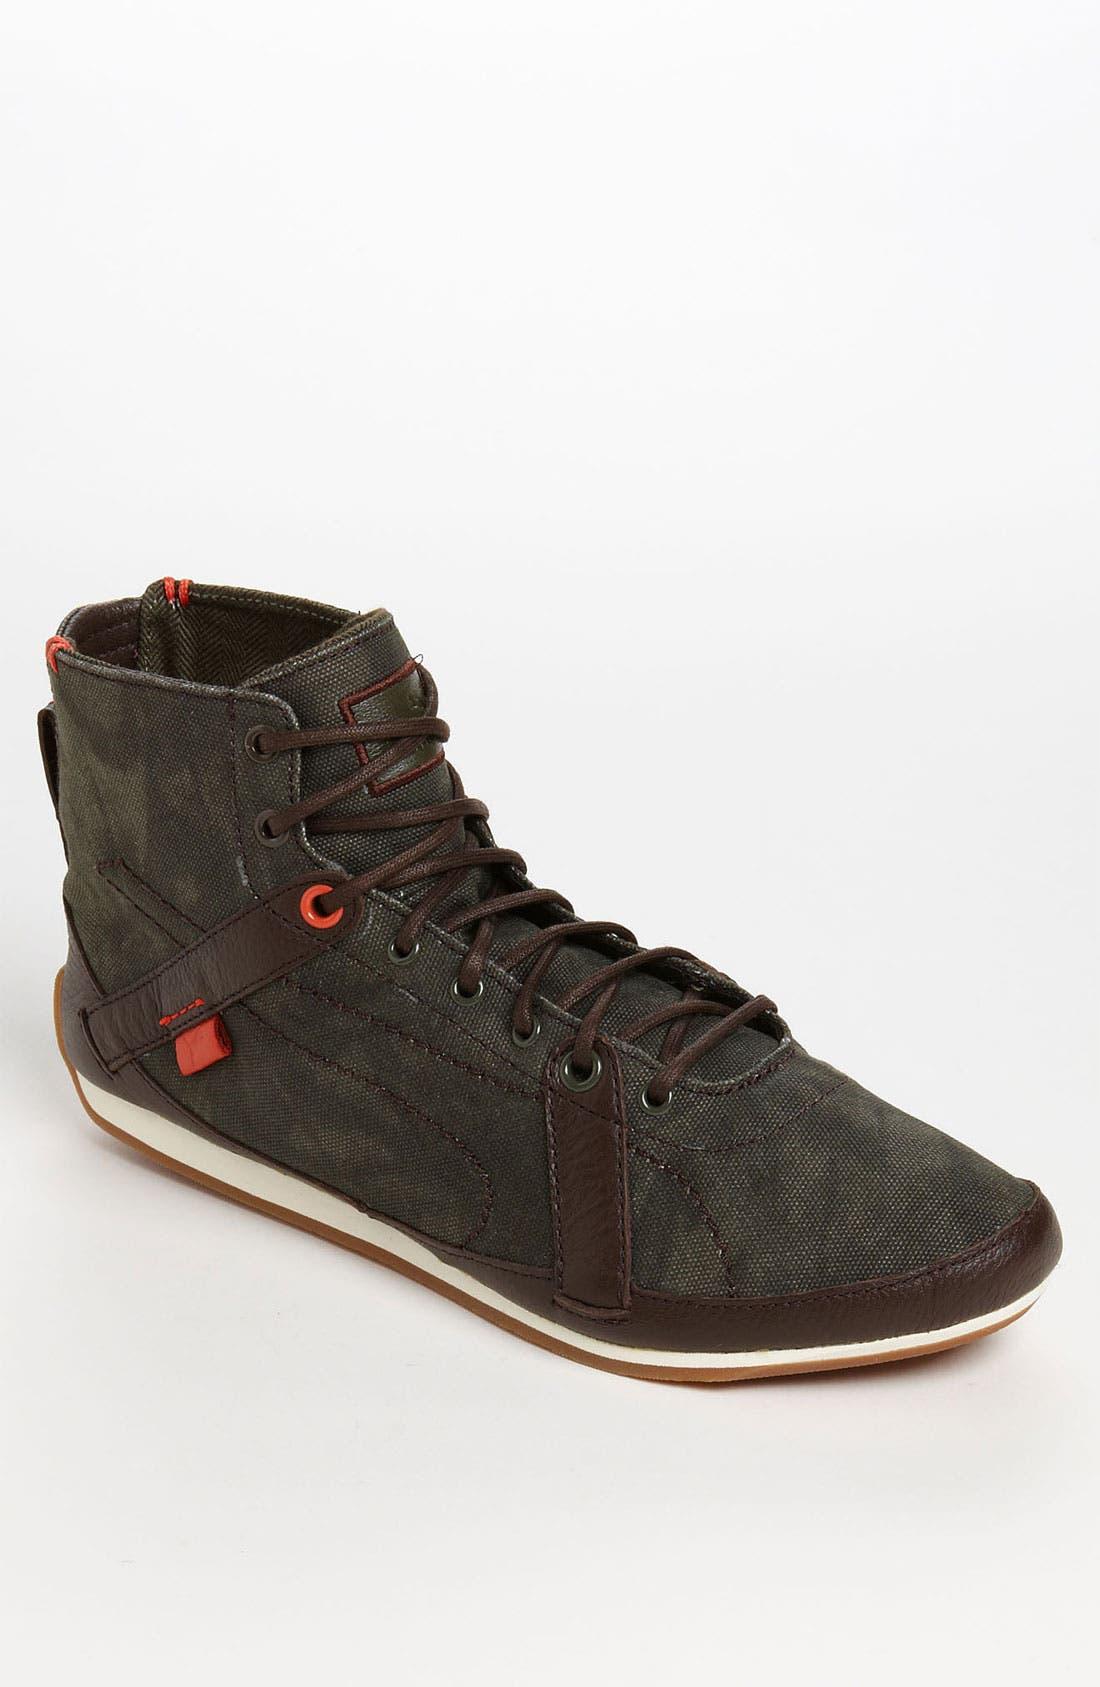 Alternate Image 1 Selected - PUMA 'Vettura Classico' Mid High Top Sneaker (Men)